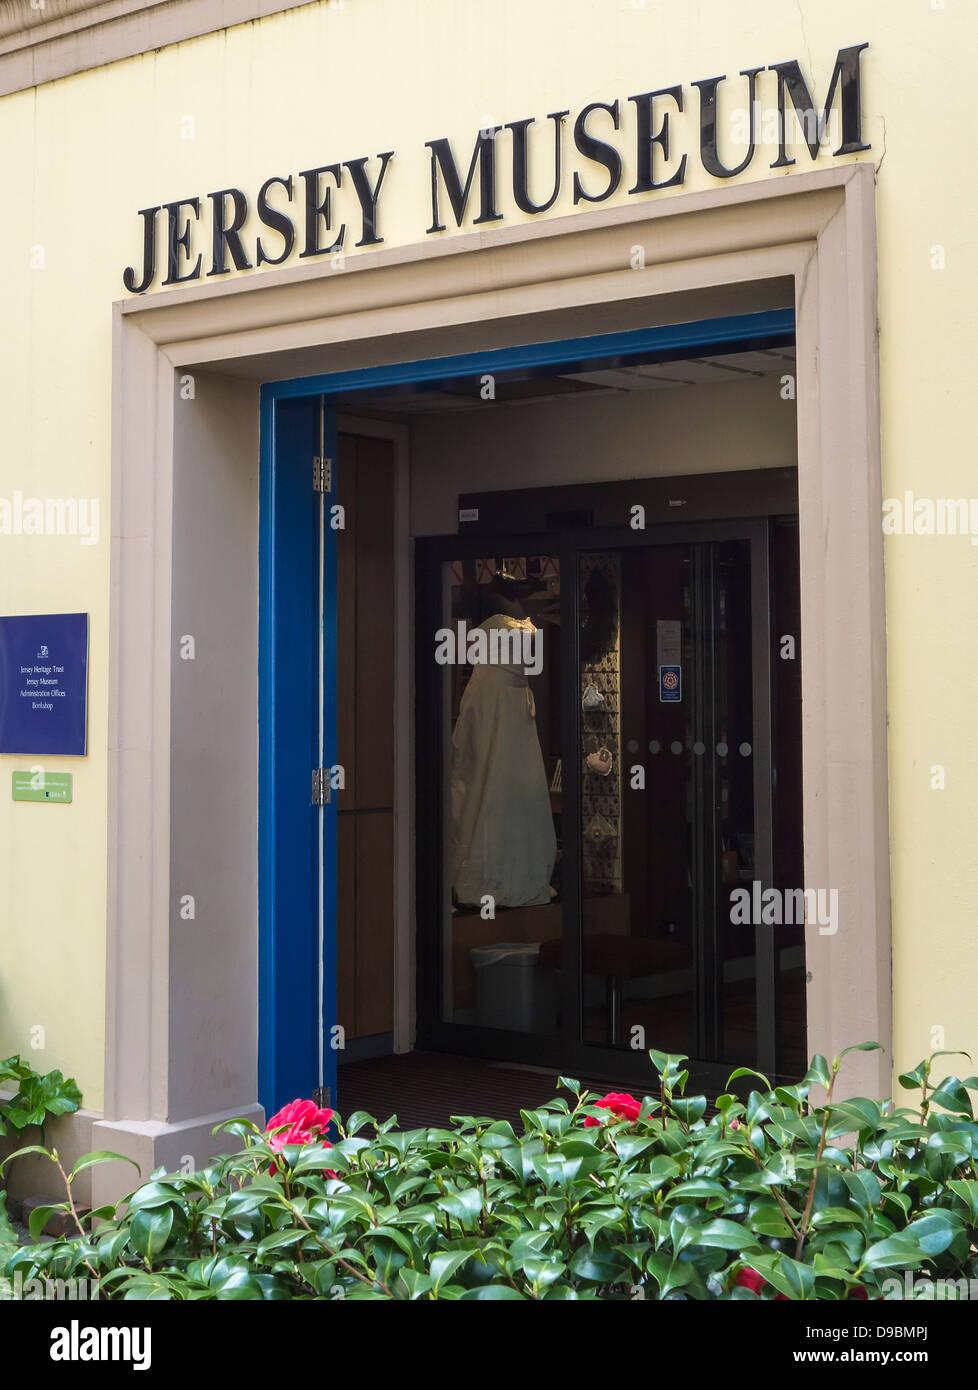 Jersey Museum, Entrance, St. Helier, Channel Islands - Stock Image